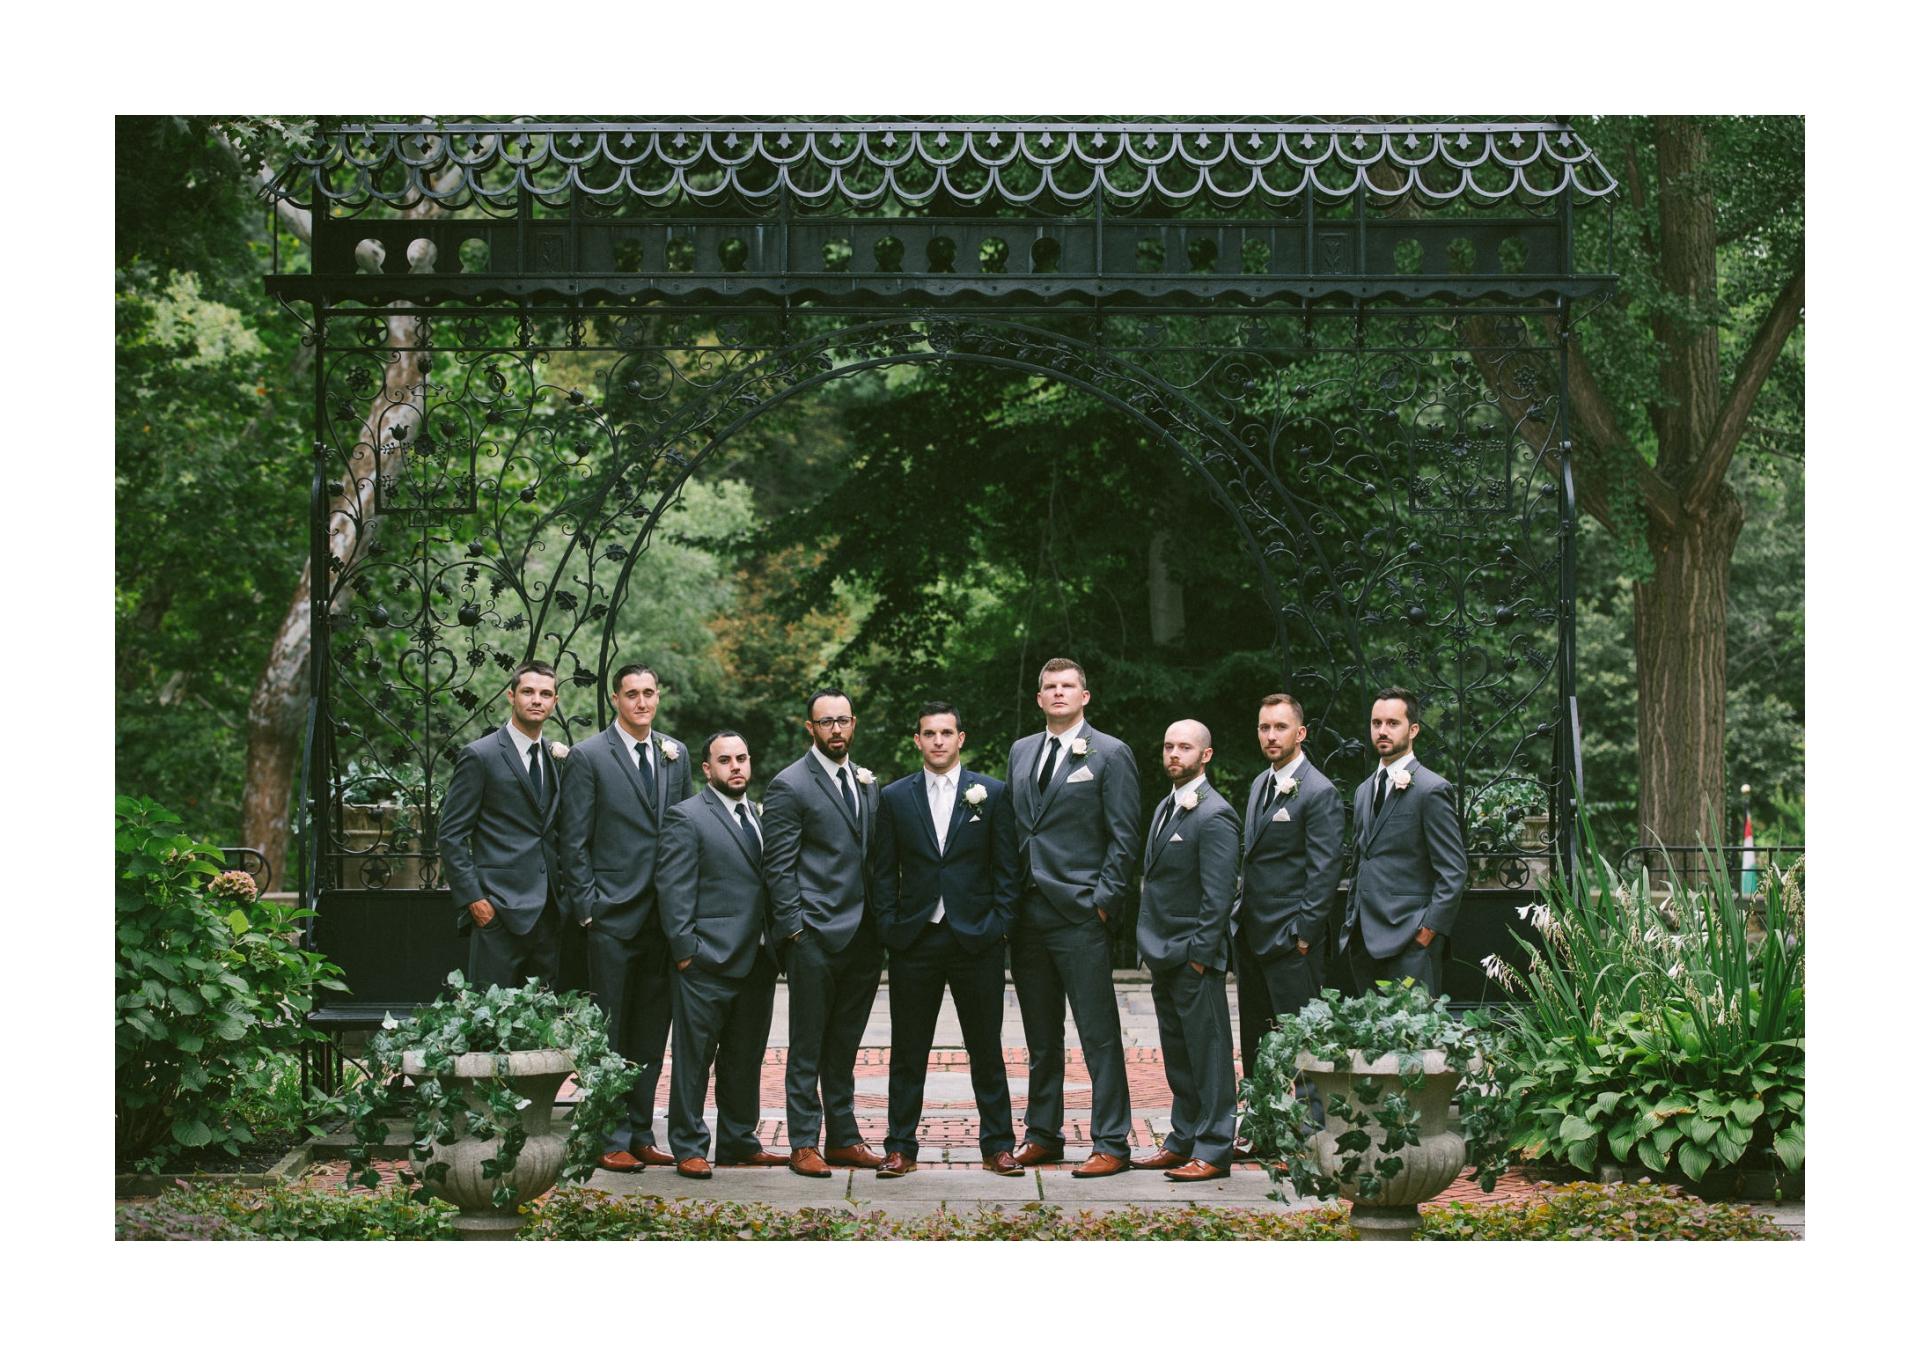 Intercontinental Hotel Wedding in Cleveland 2 14.jpg